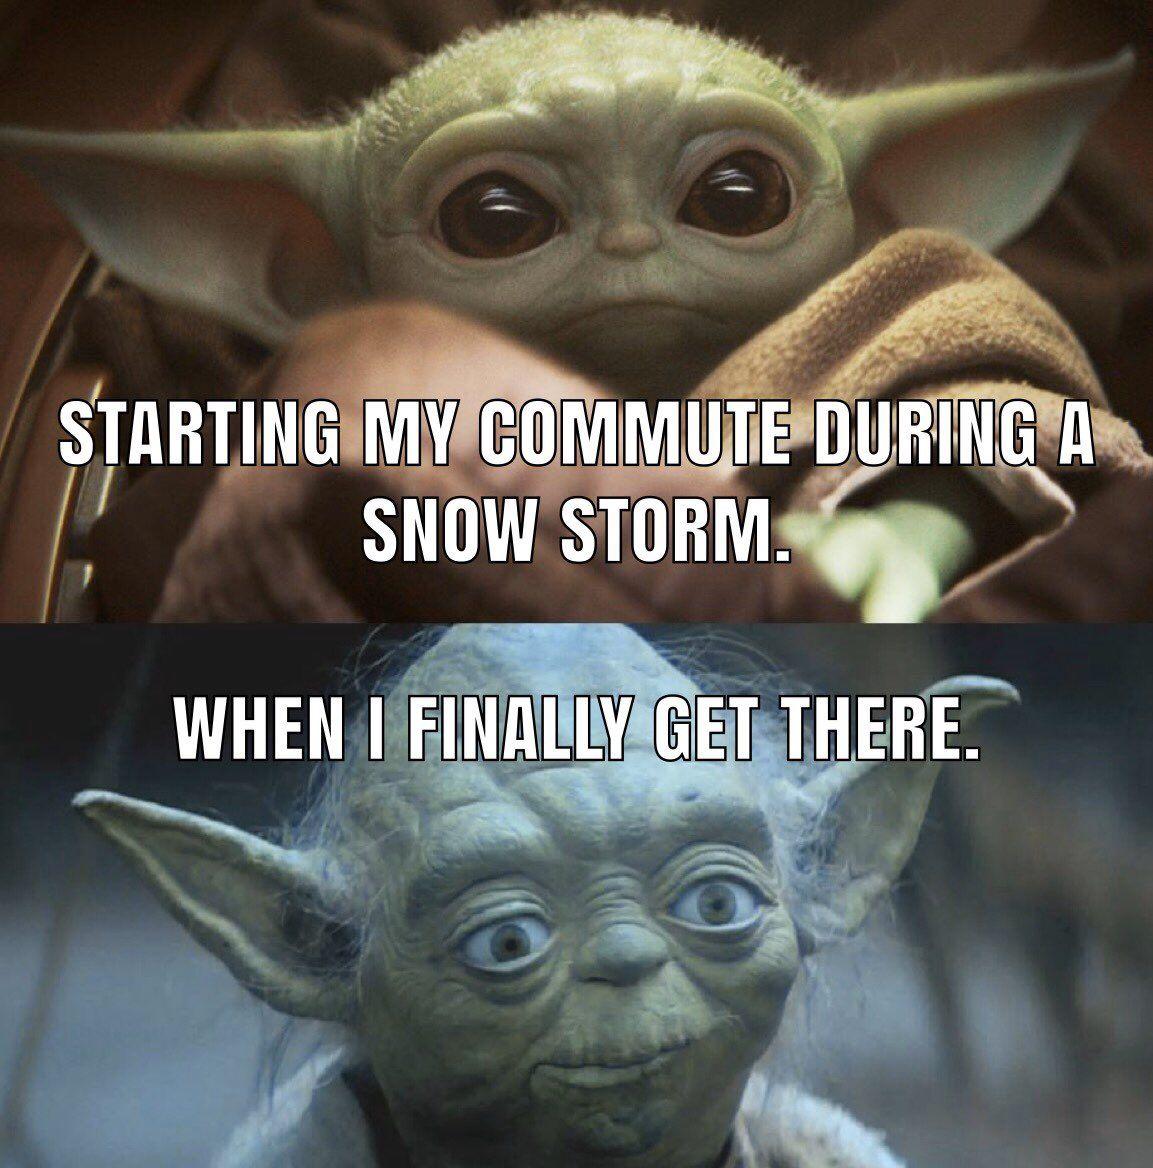 As A Bus Driver I Did Chuckle At This Themandaloriantv Yoda Funny Yoda Meme Star Wars Memes